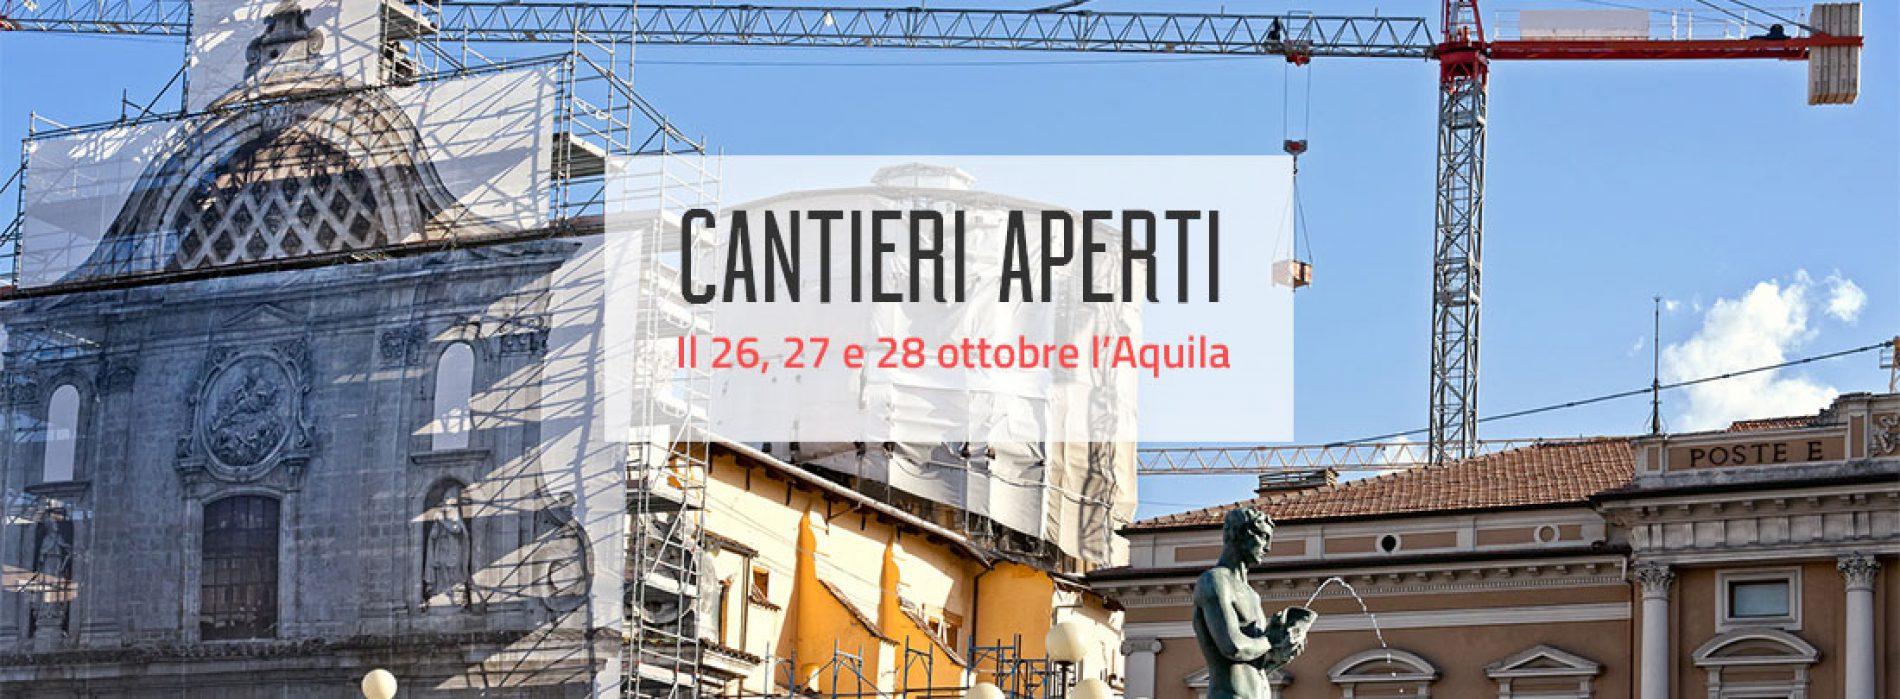 "Officina L'Aquila: ""cantieri aperti"" di ottobre e convegni"